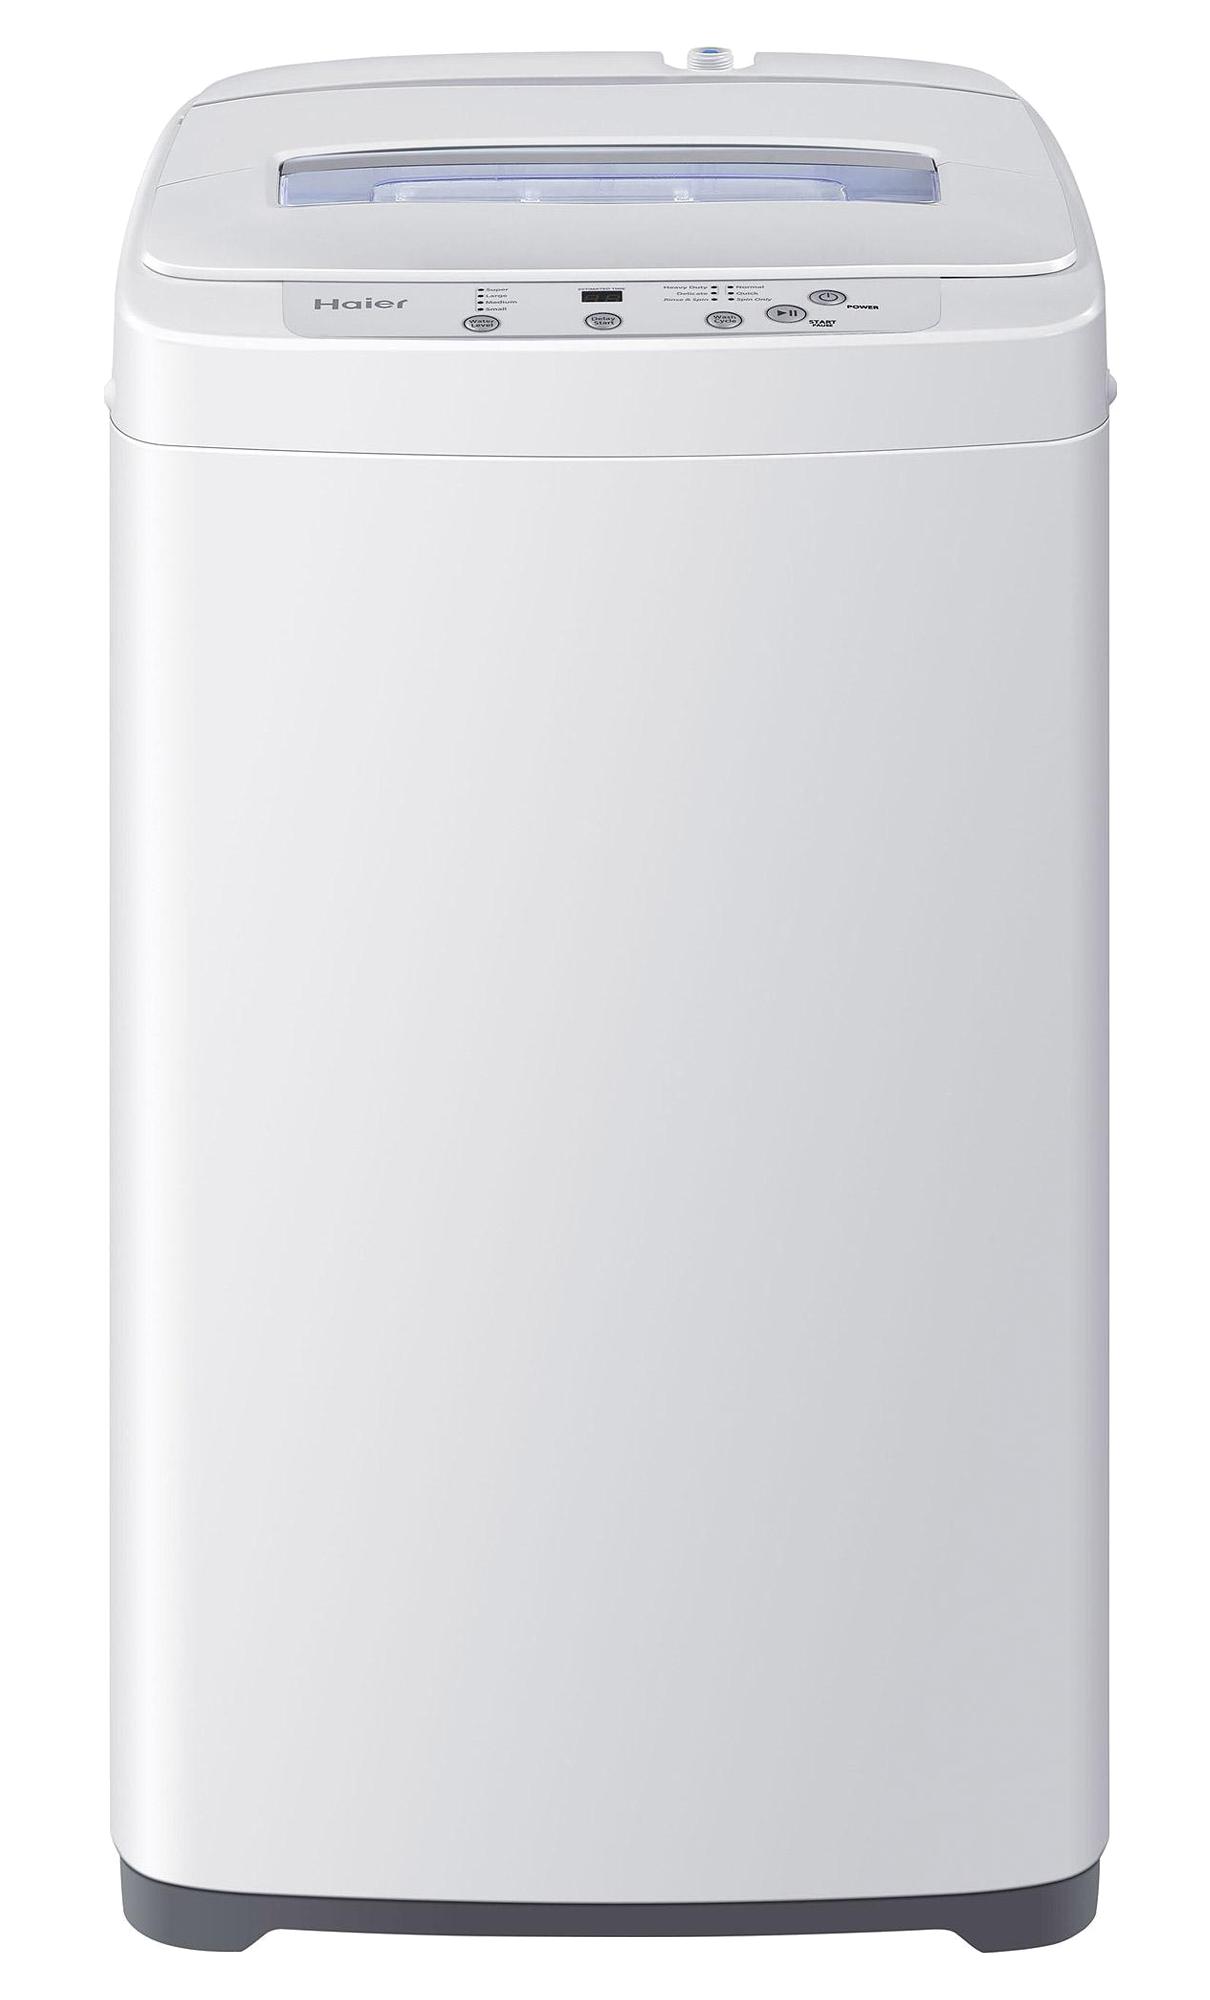 Washing Machine Png Image Washing Machine Png Images Home Appliances